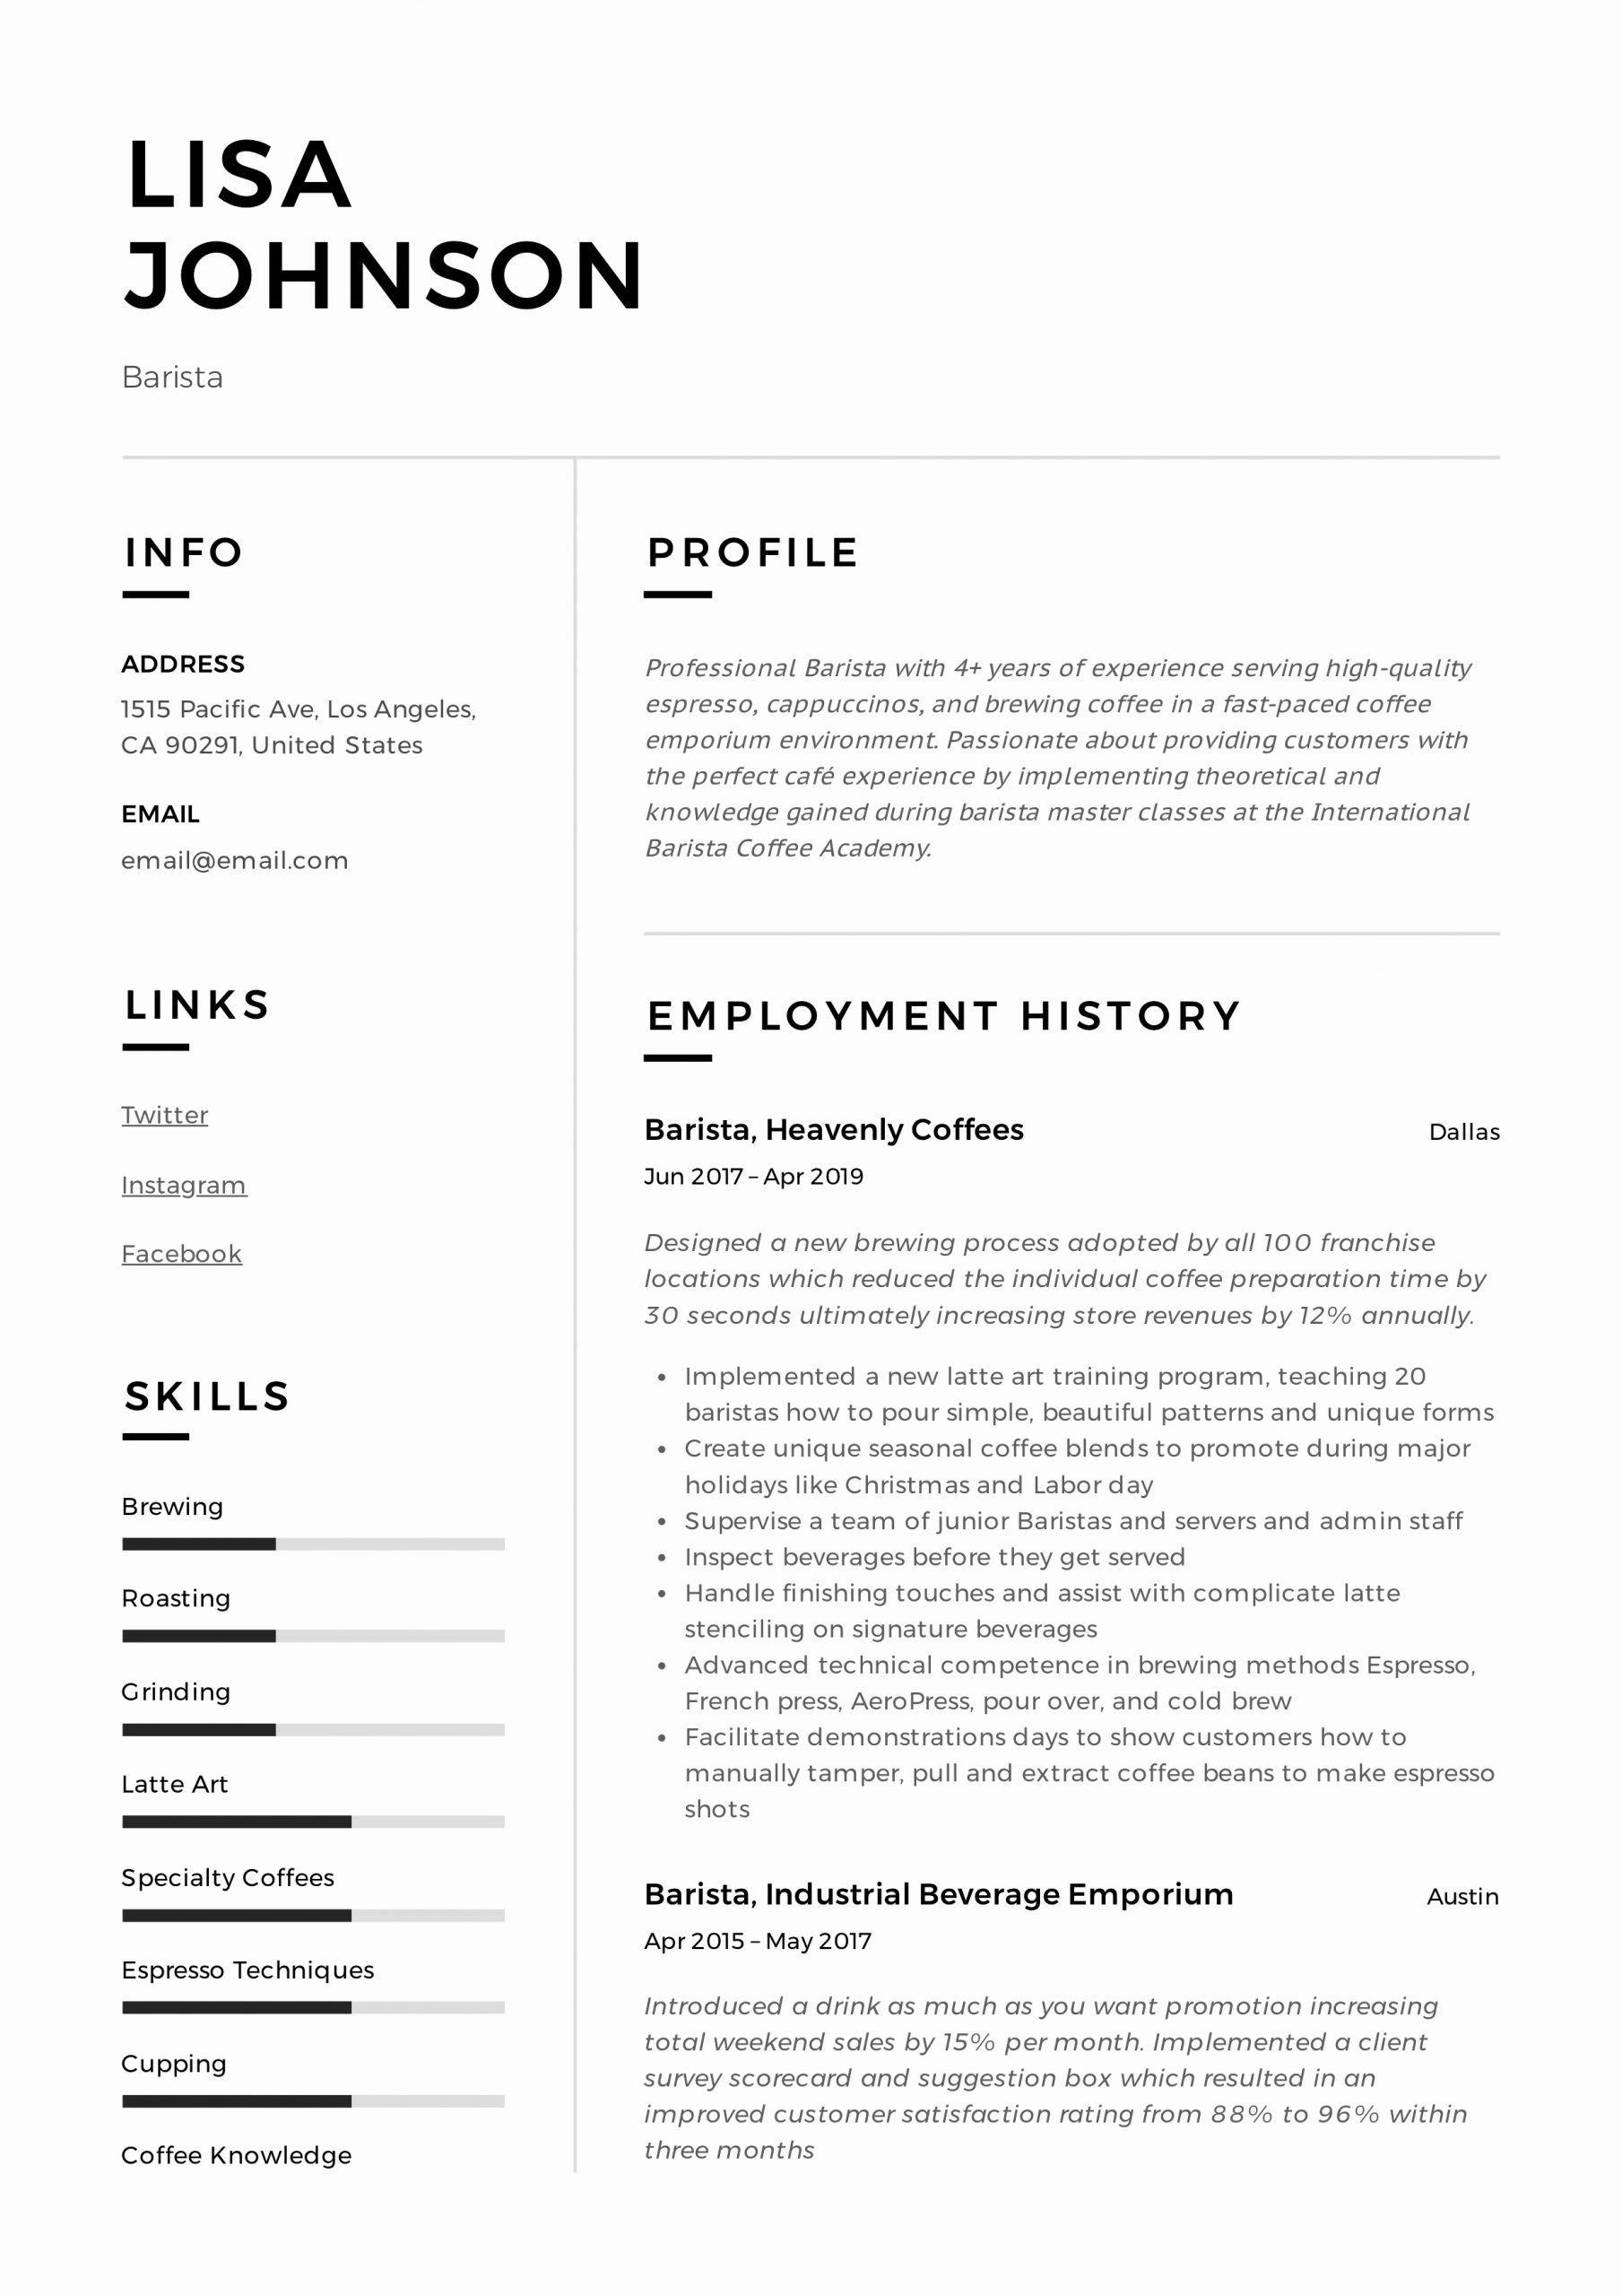 Barista Resume No Experience Unique Barista Resume Writing Guide 12 Resume Templates Resume Examples Basic Resume Examples Professional Resume Examples